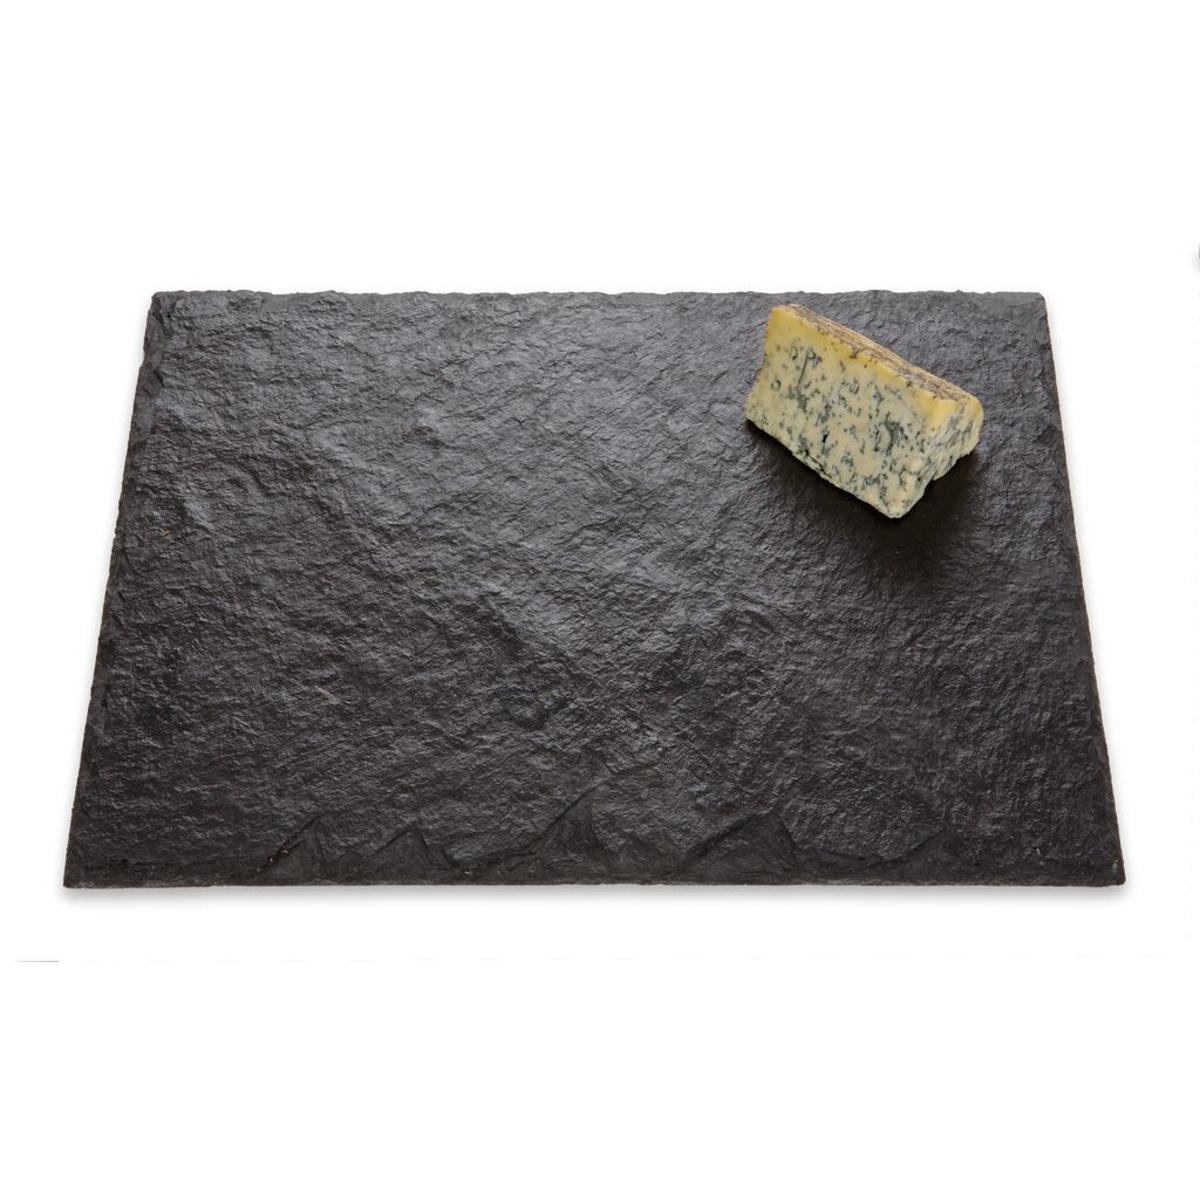 JK Adams Strata Slate 16 x 12 Inch Cheese Tray